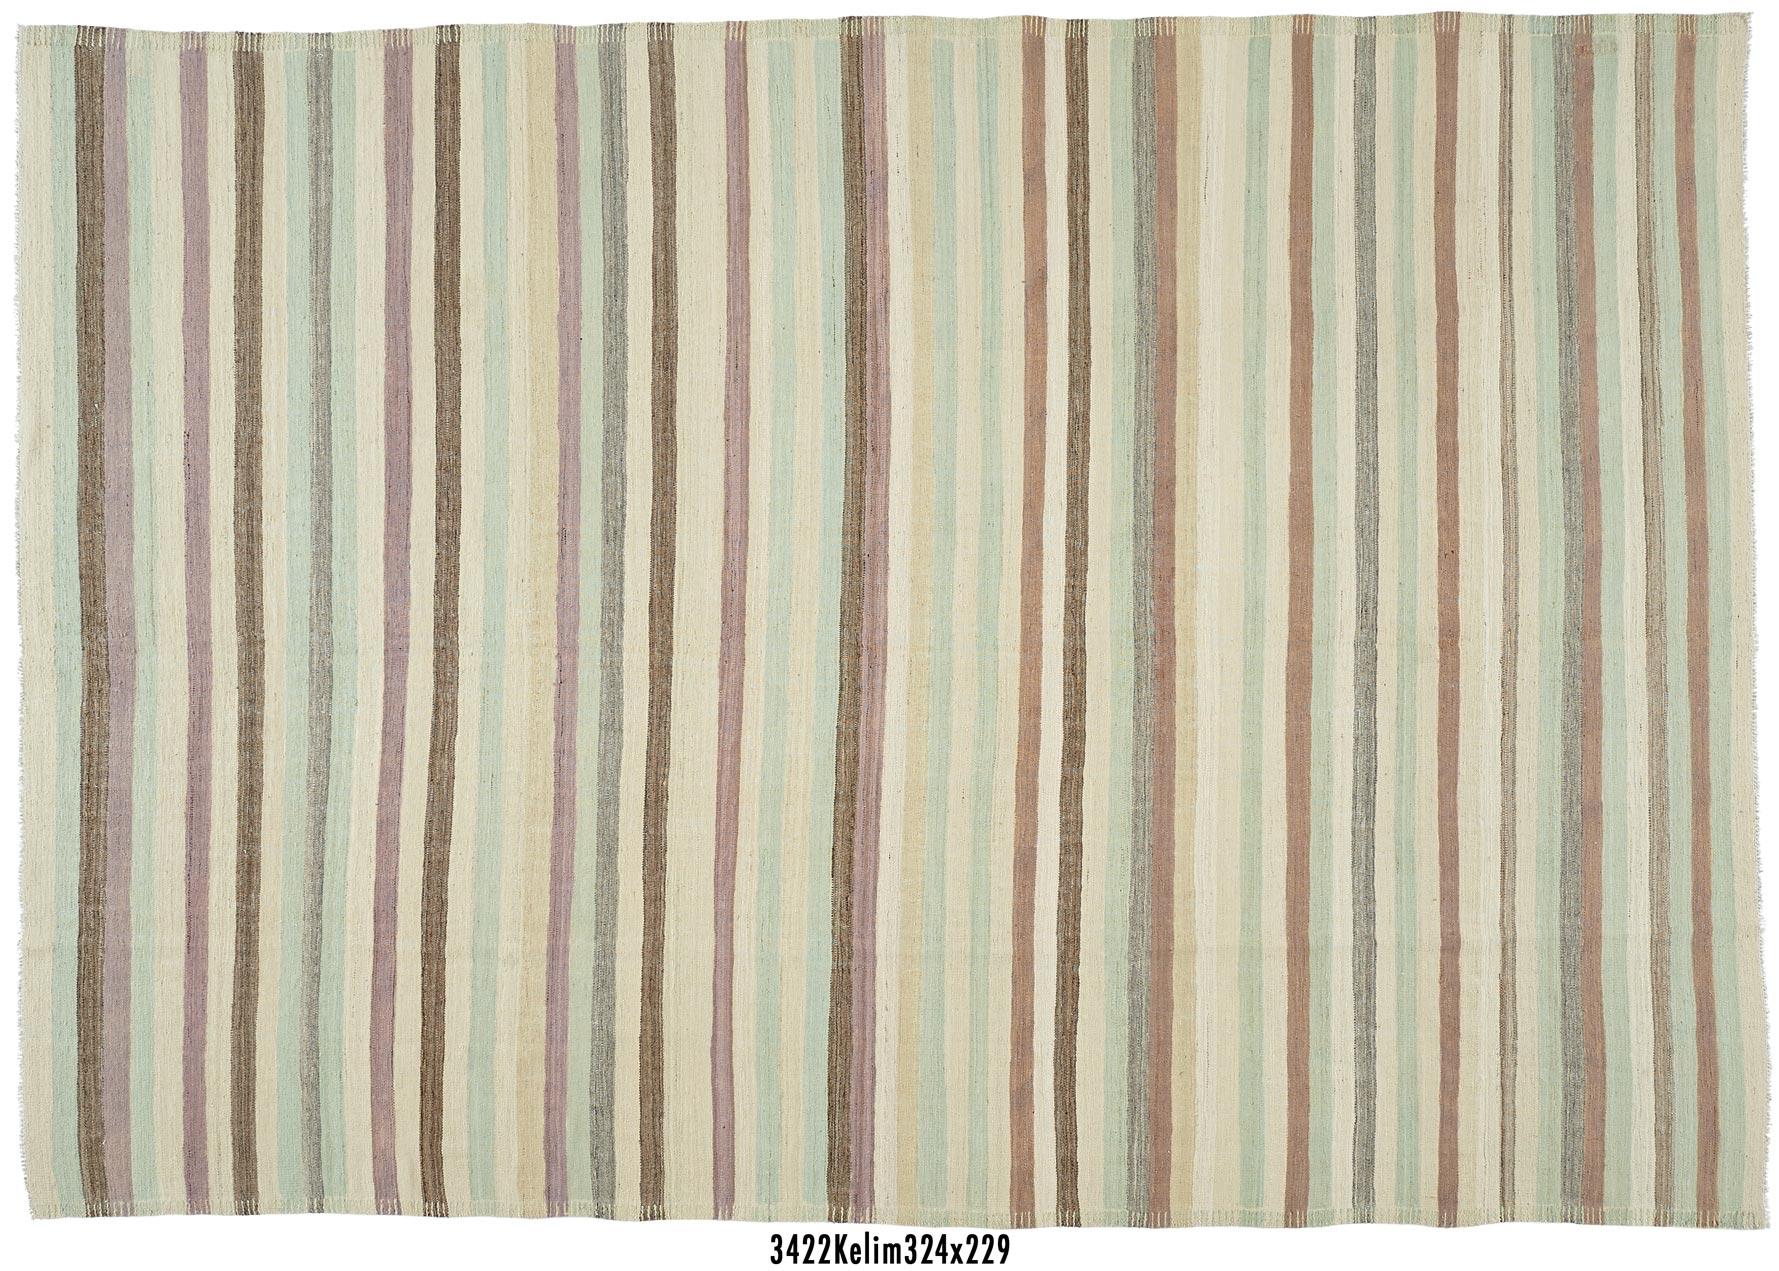 3422 kelim 324x229 ariana rugs. Black Bedroom Furniture Sets. Home Design Ideas